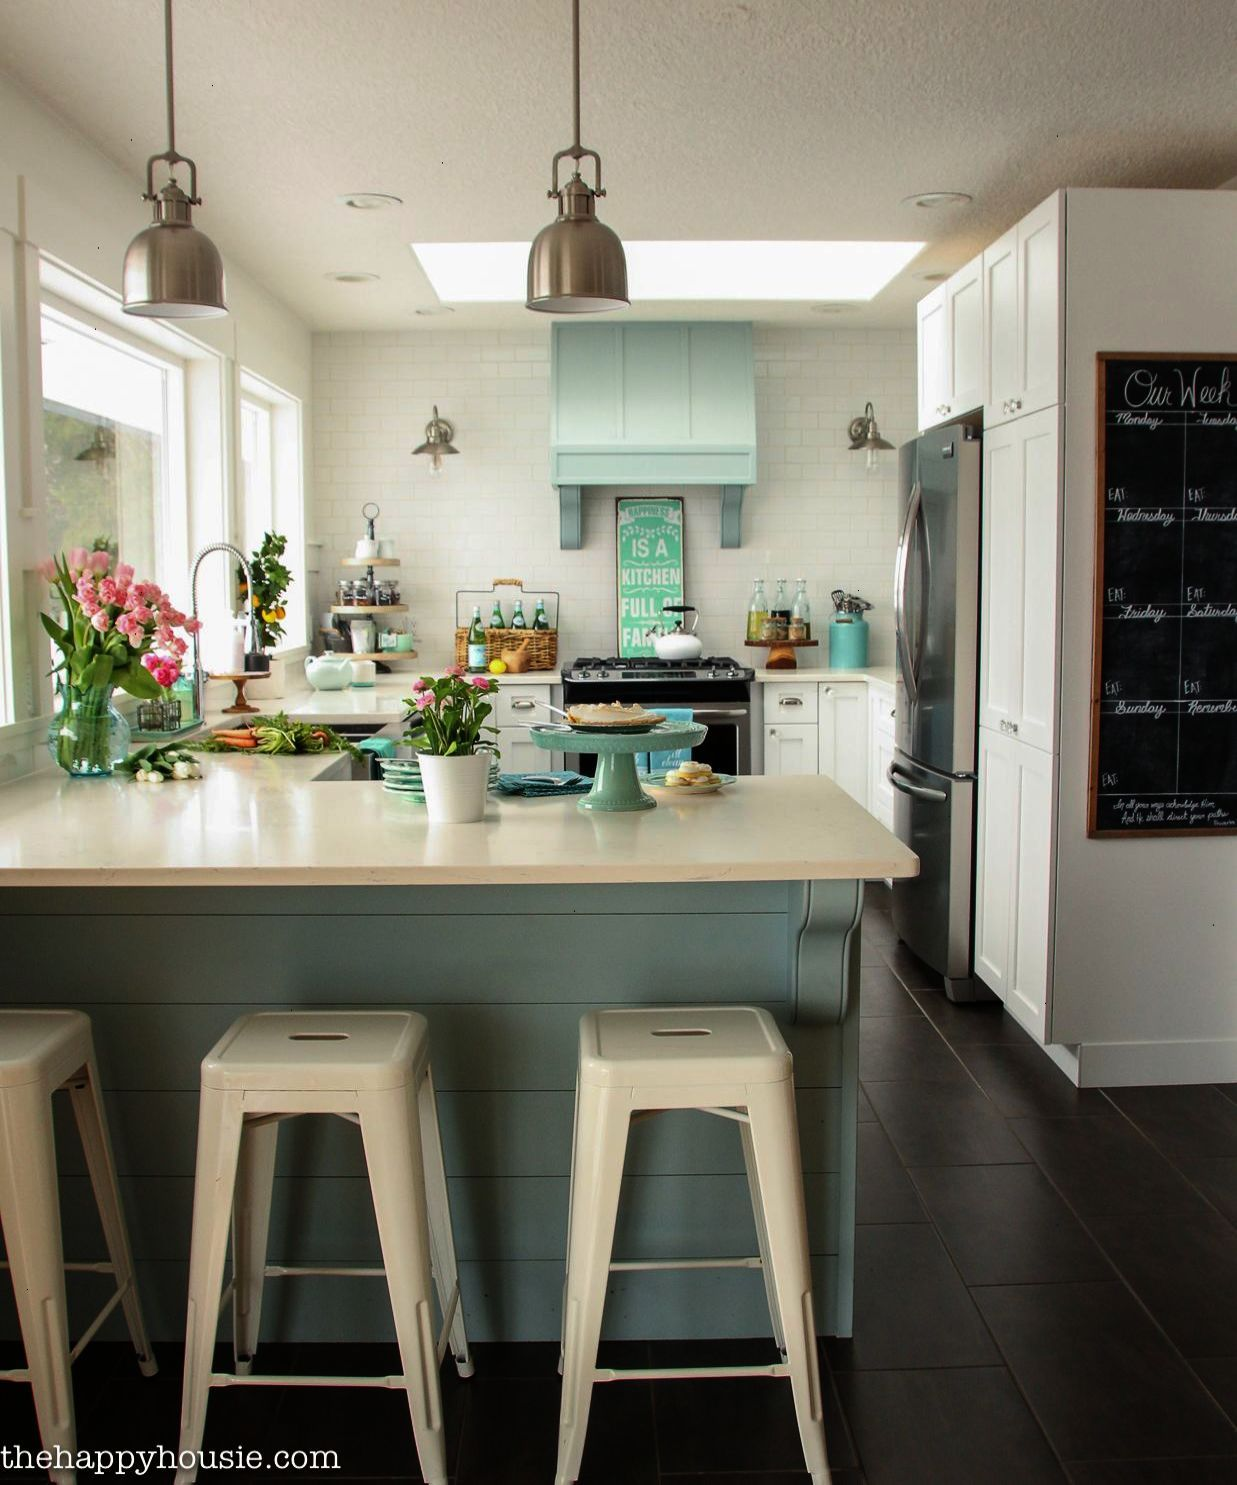 Trendy U003e Coastal Cottages Ami Reviews!!